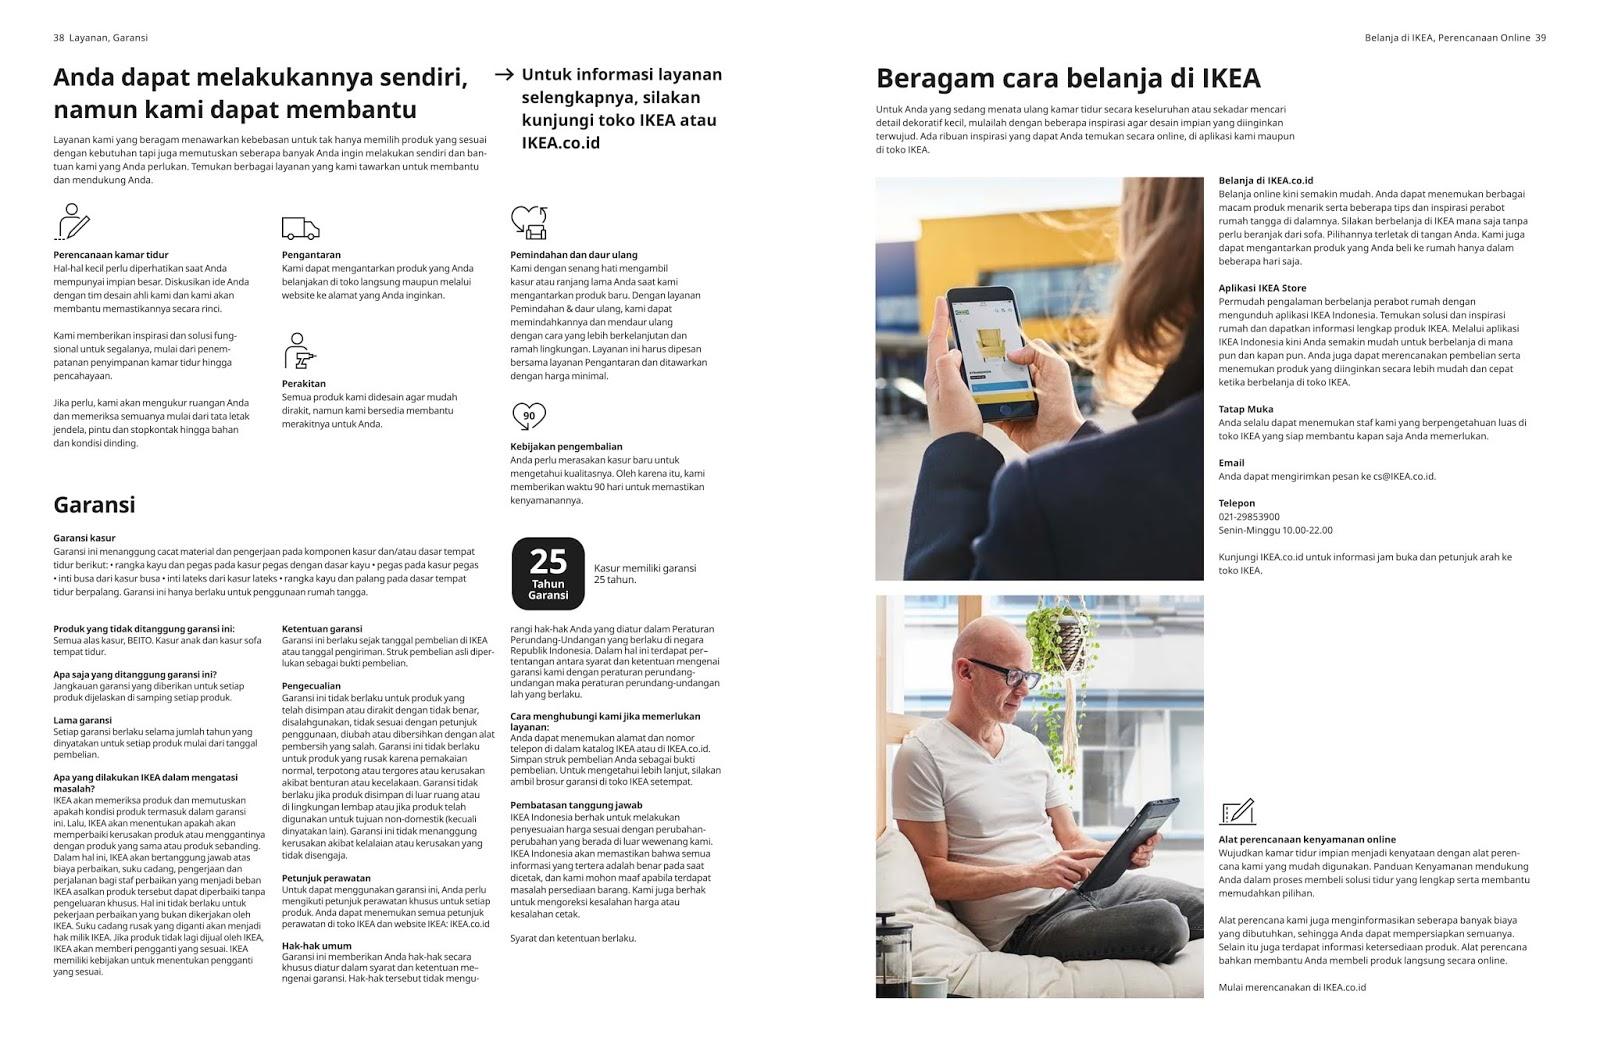 KATALOG KAMAR TIDUR HARGA PROMO IKEA TERBARU 2020